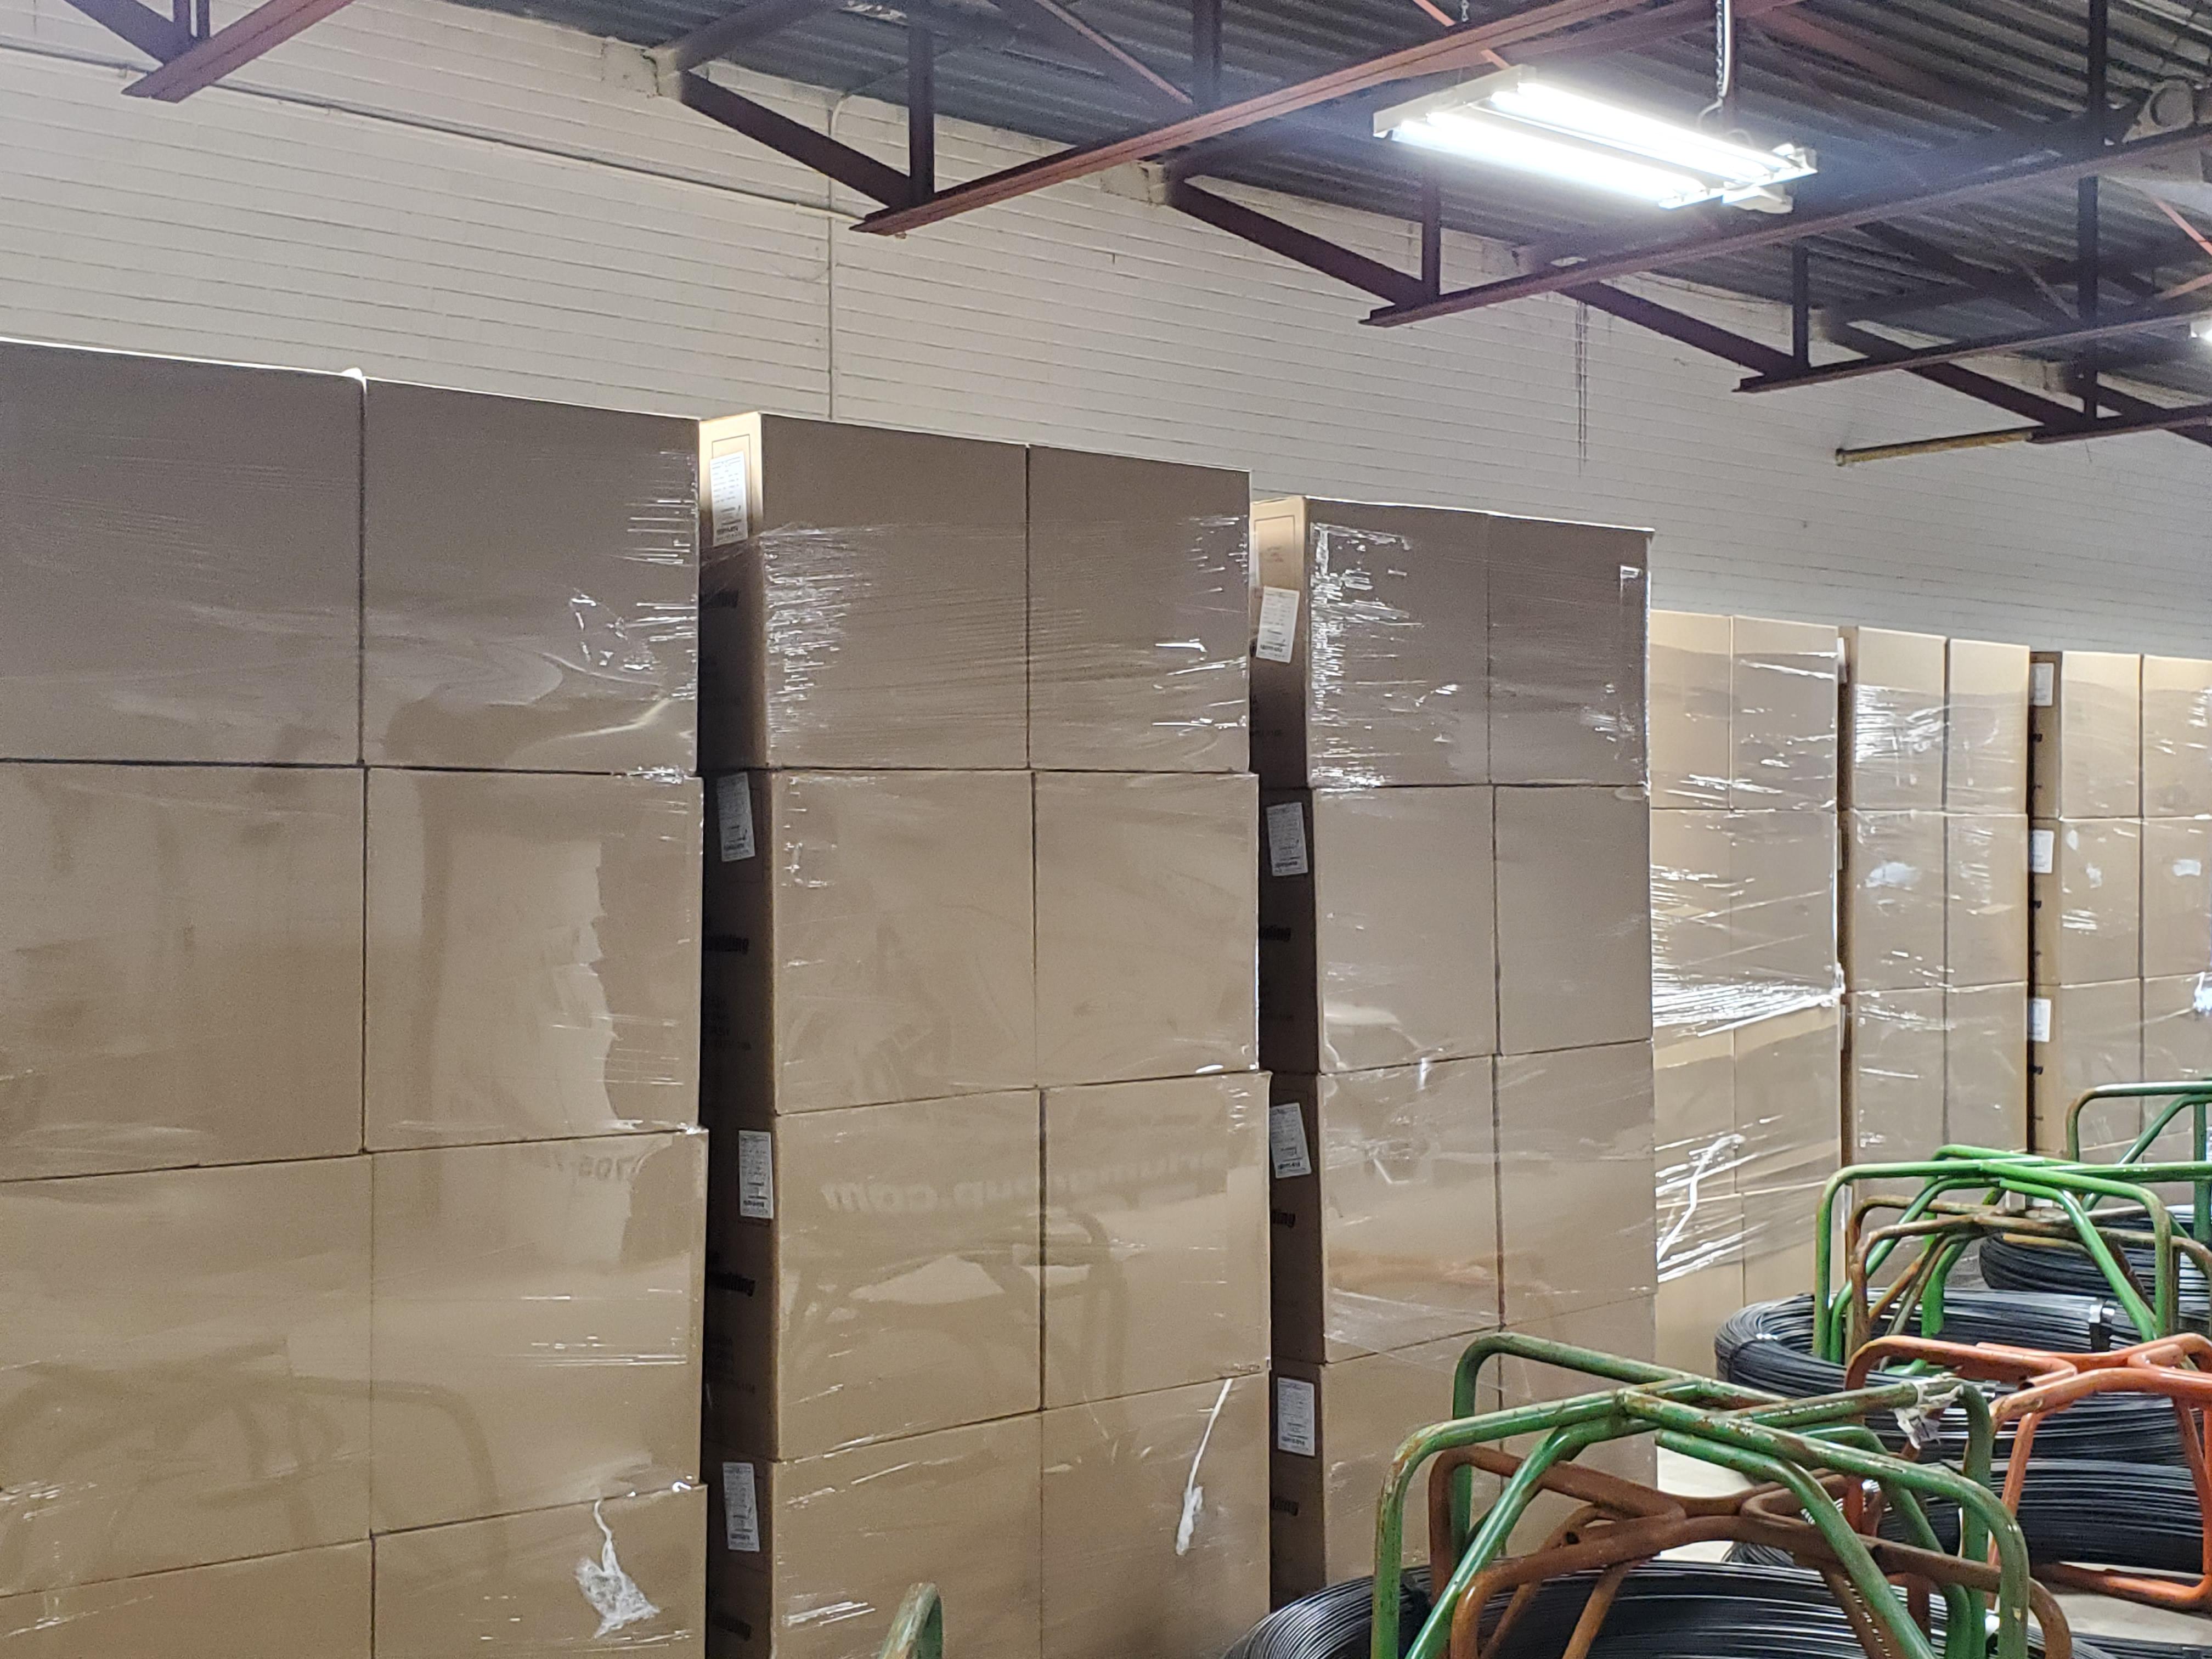 10,000 HDPE Bottles, NATURAL, NEW, 24/410 Neck, 16oz Boston Round - Image 3 of 6